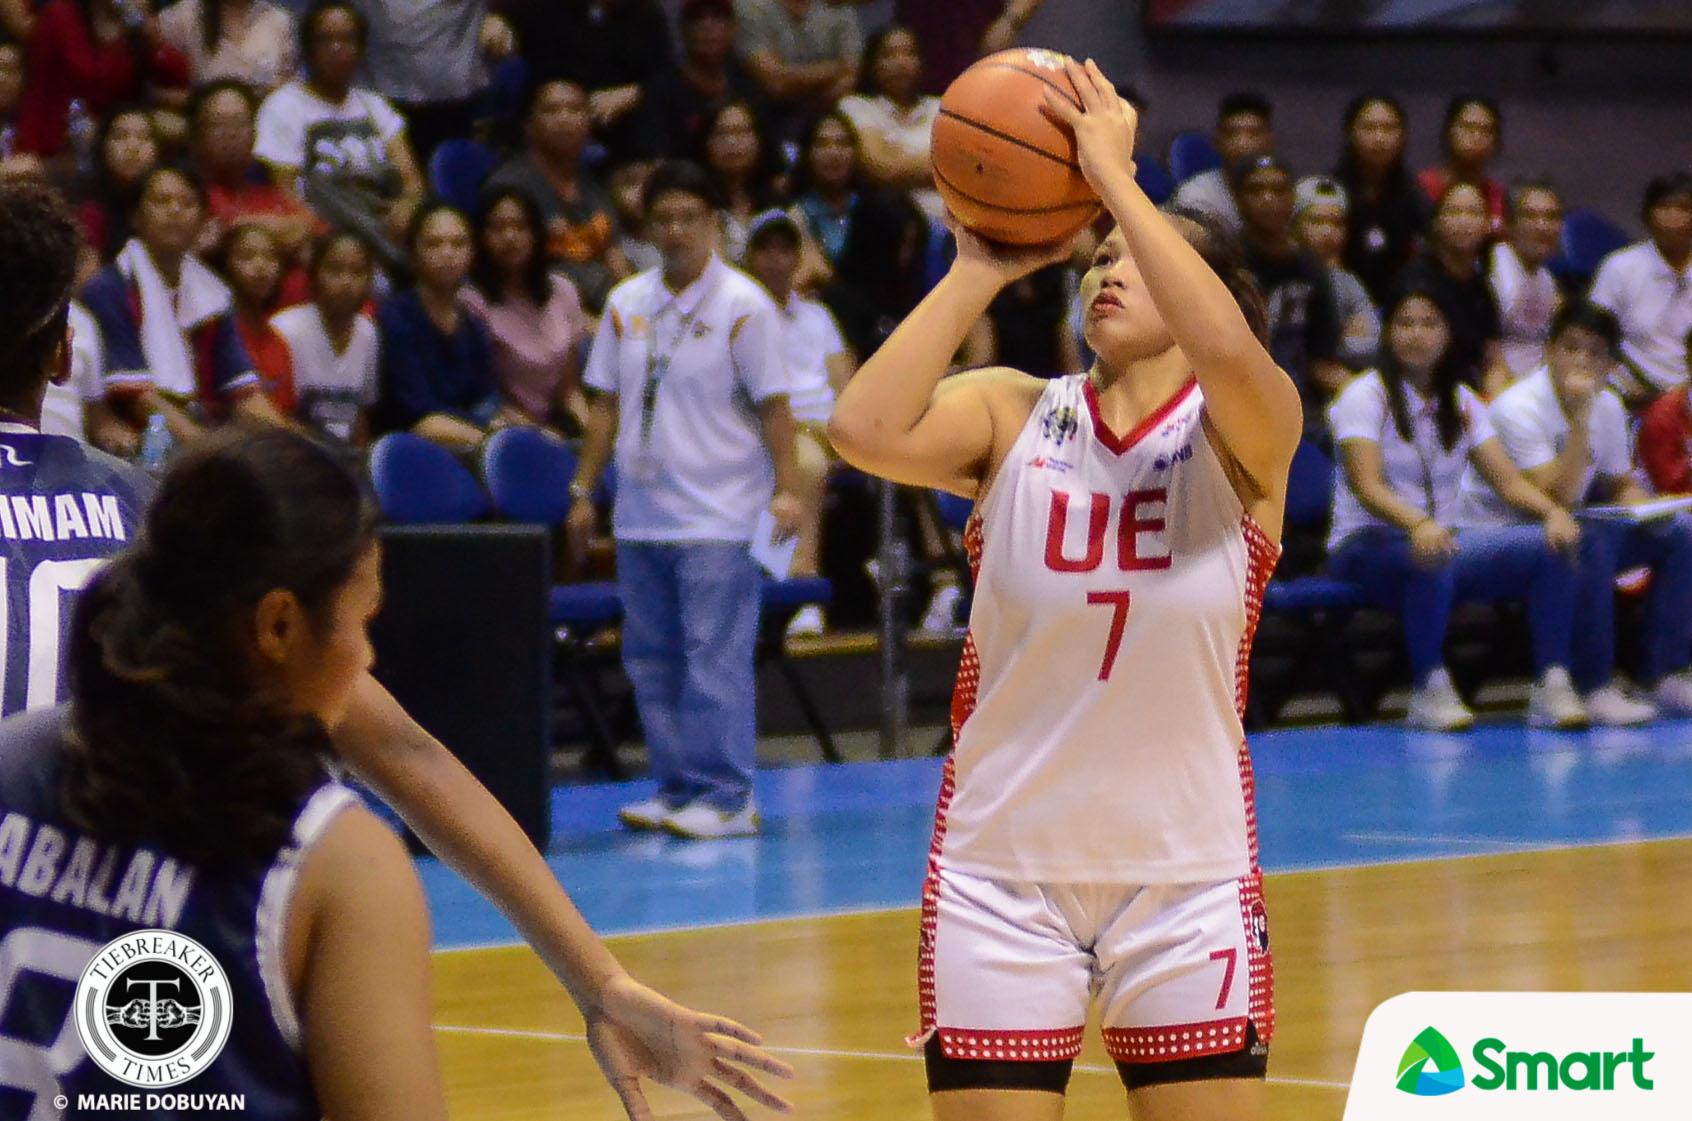 UAAP-80-Womens-Final-NU-UE-Chan-8586 Graduating seniors, Aileen Lebornio laud valiant UE after Finals loss to NU Basketball News UAAP UE  - philippine sports news